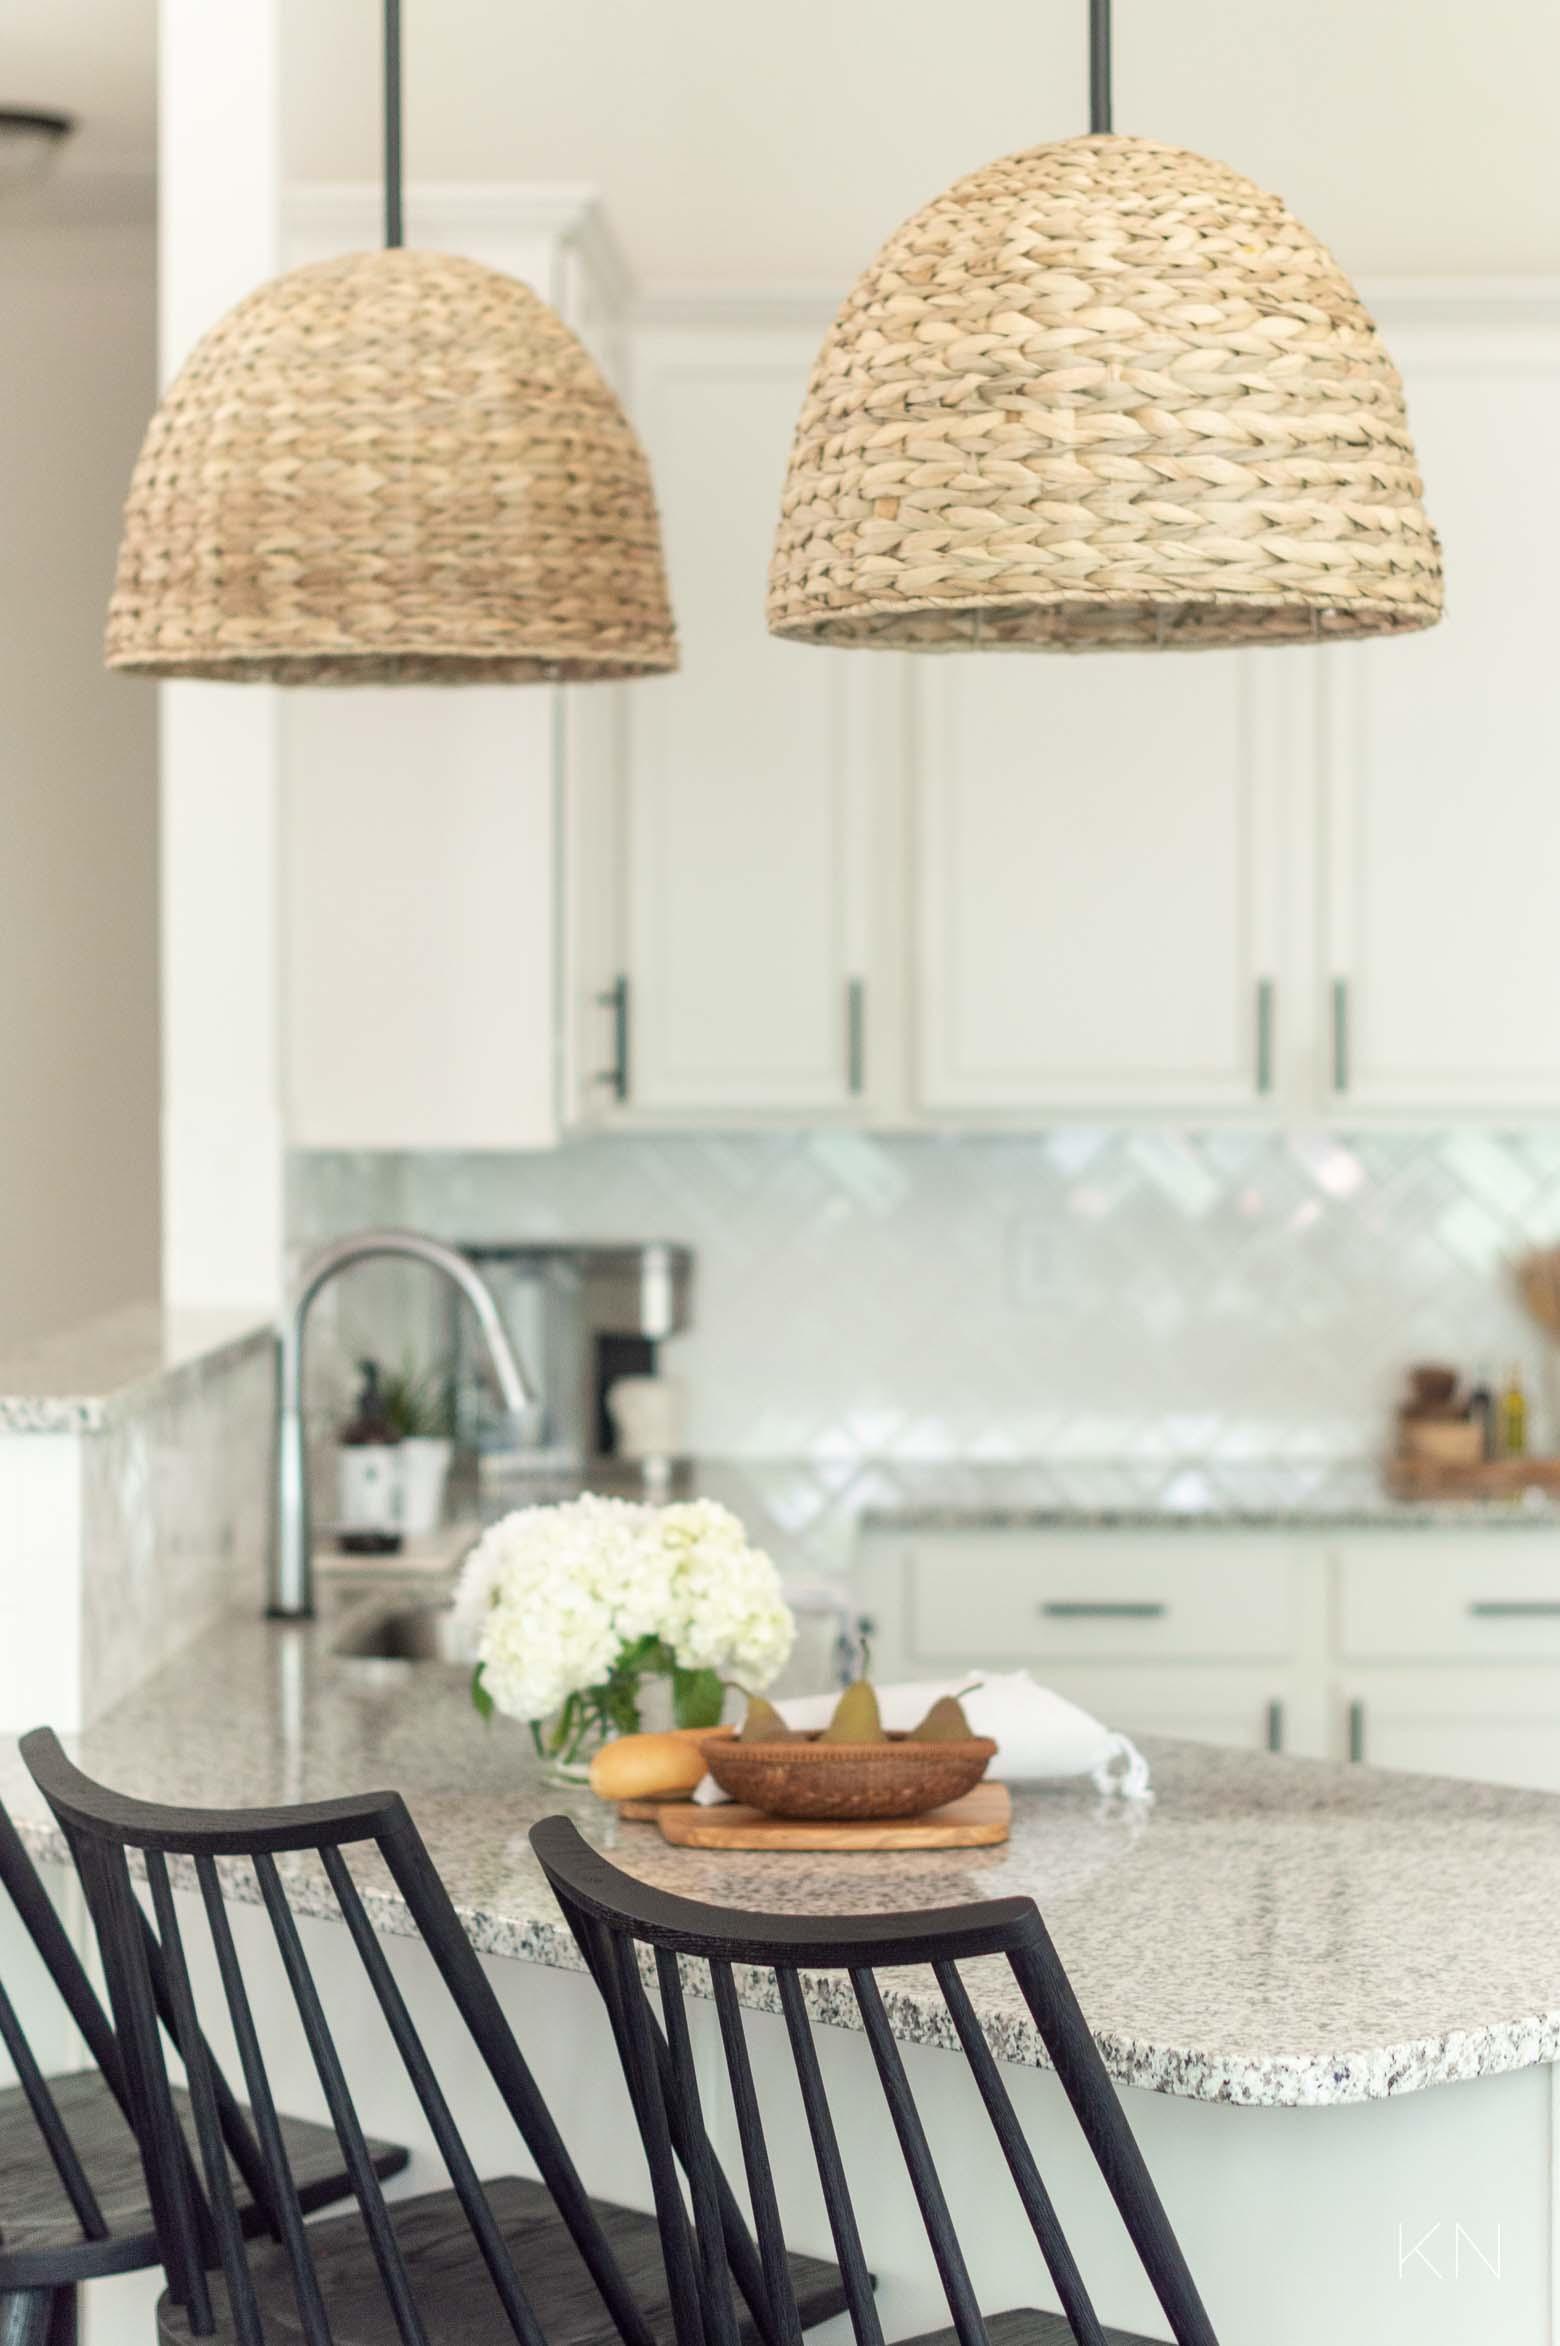 Switching Lights & Simple Ways to Update a Builder Grade Kitchen